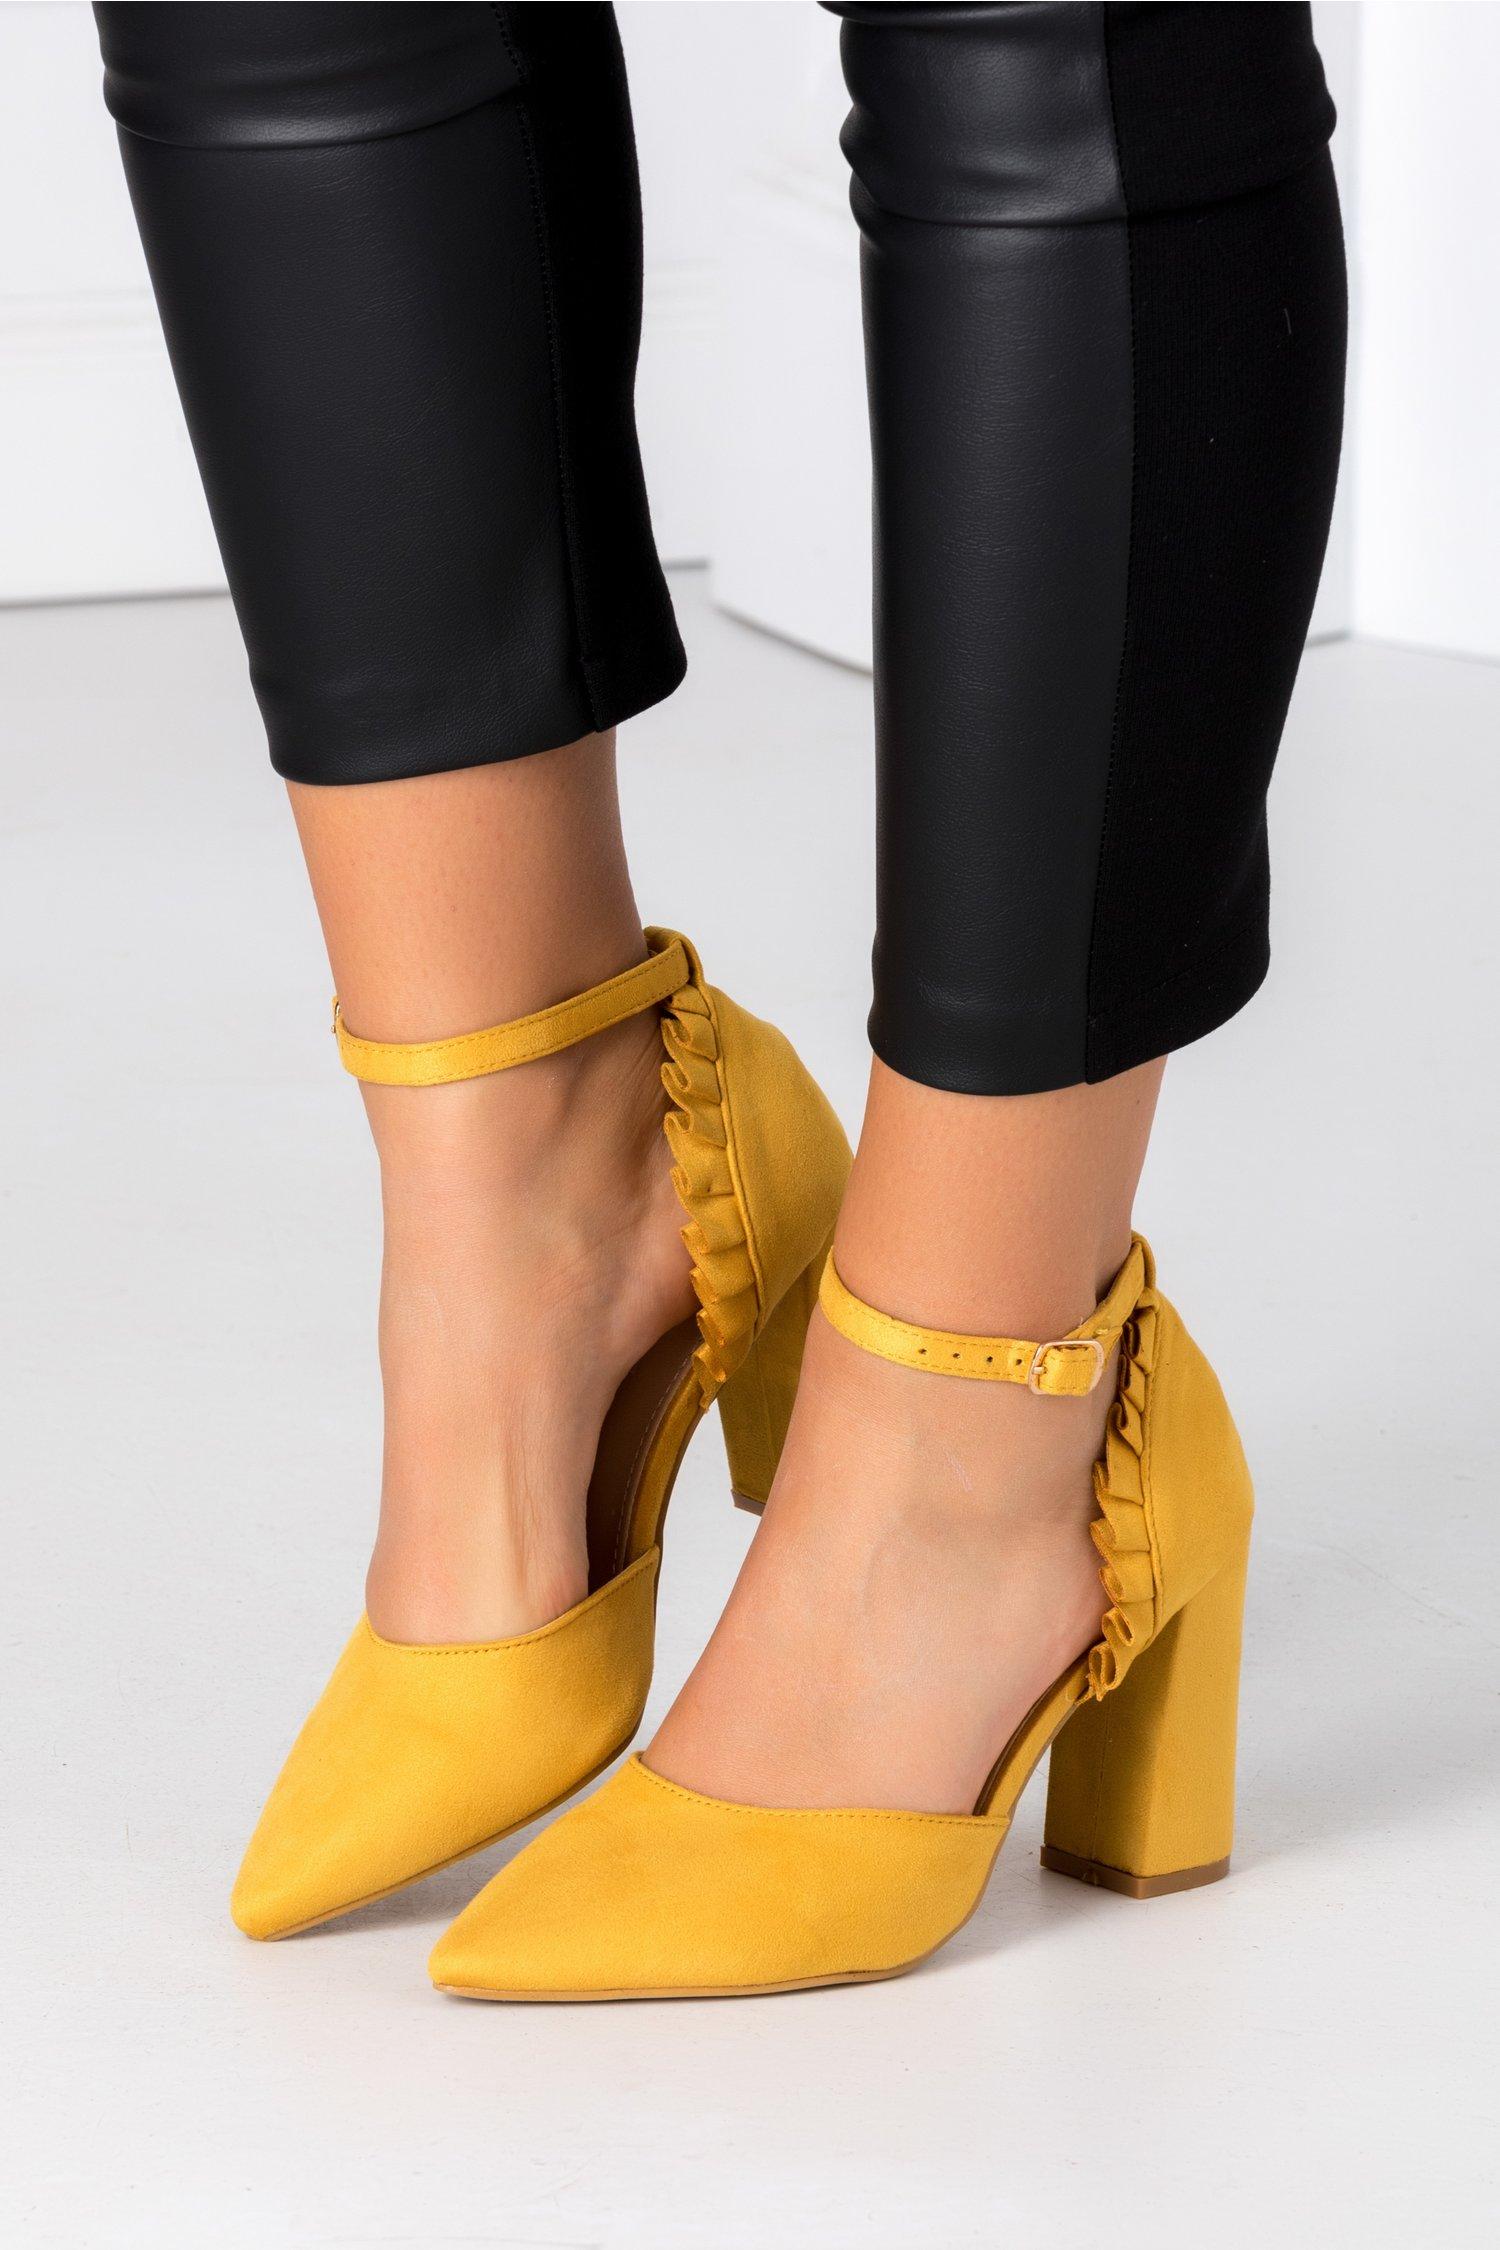 Pantofi Ida galben mustar cu volanase la spate